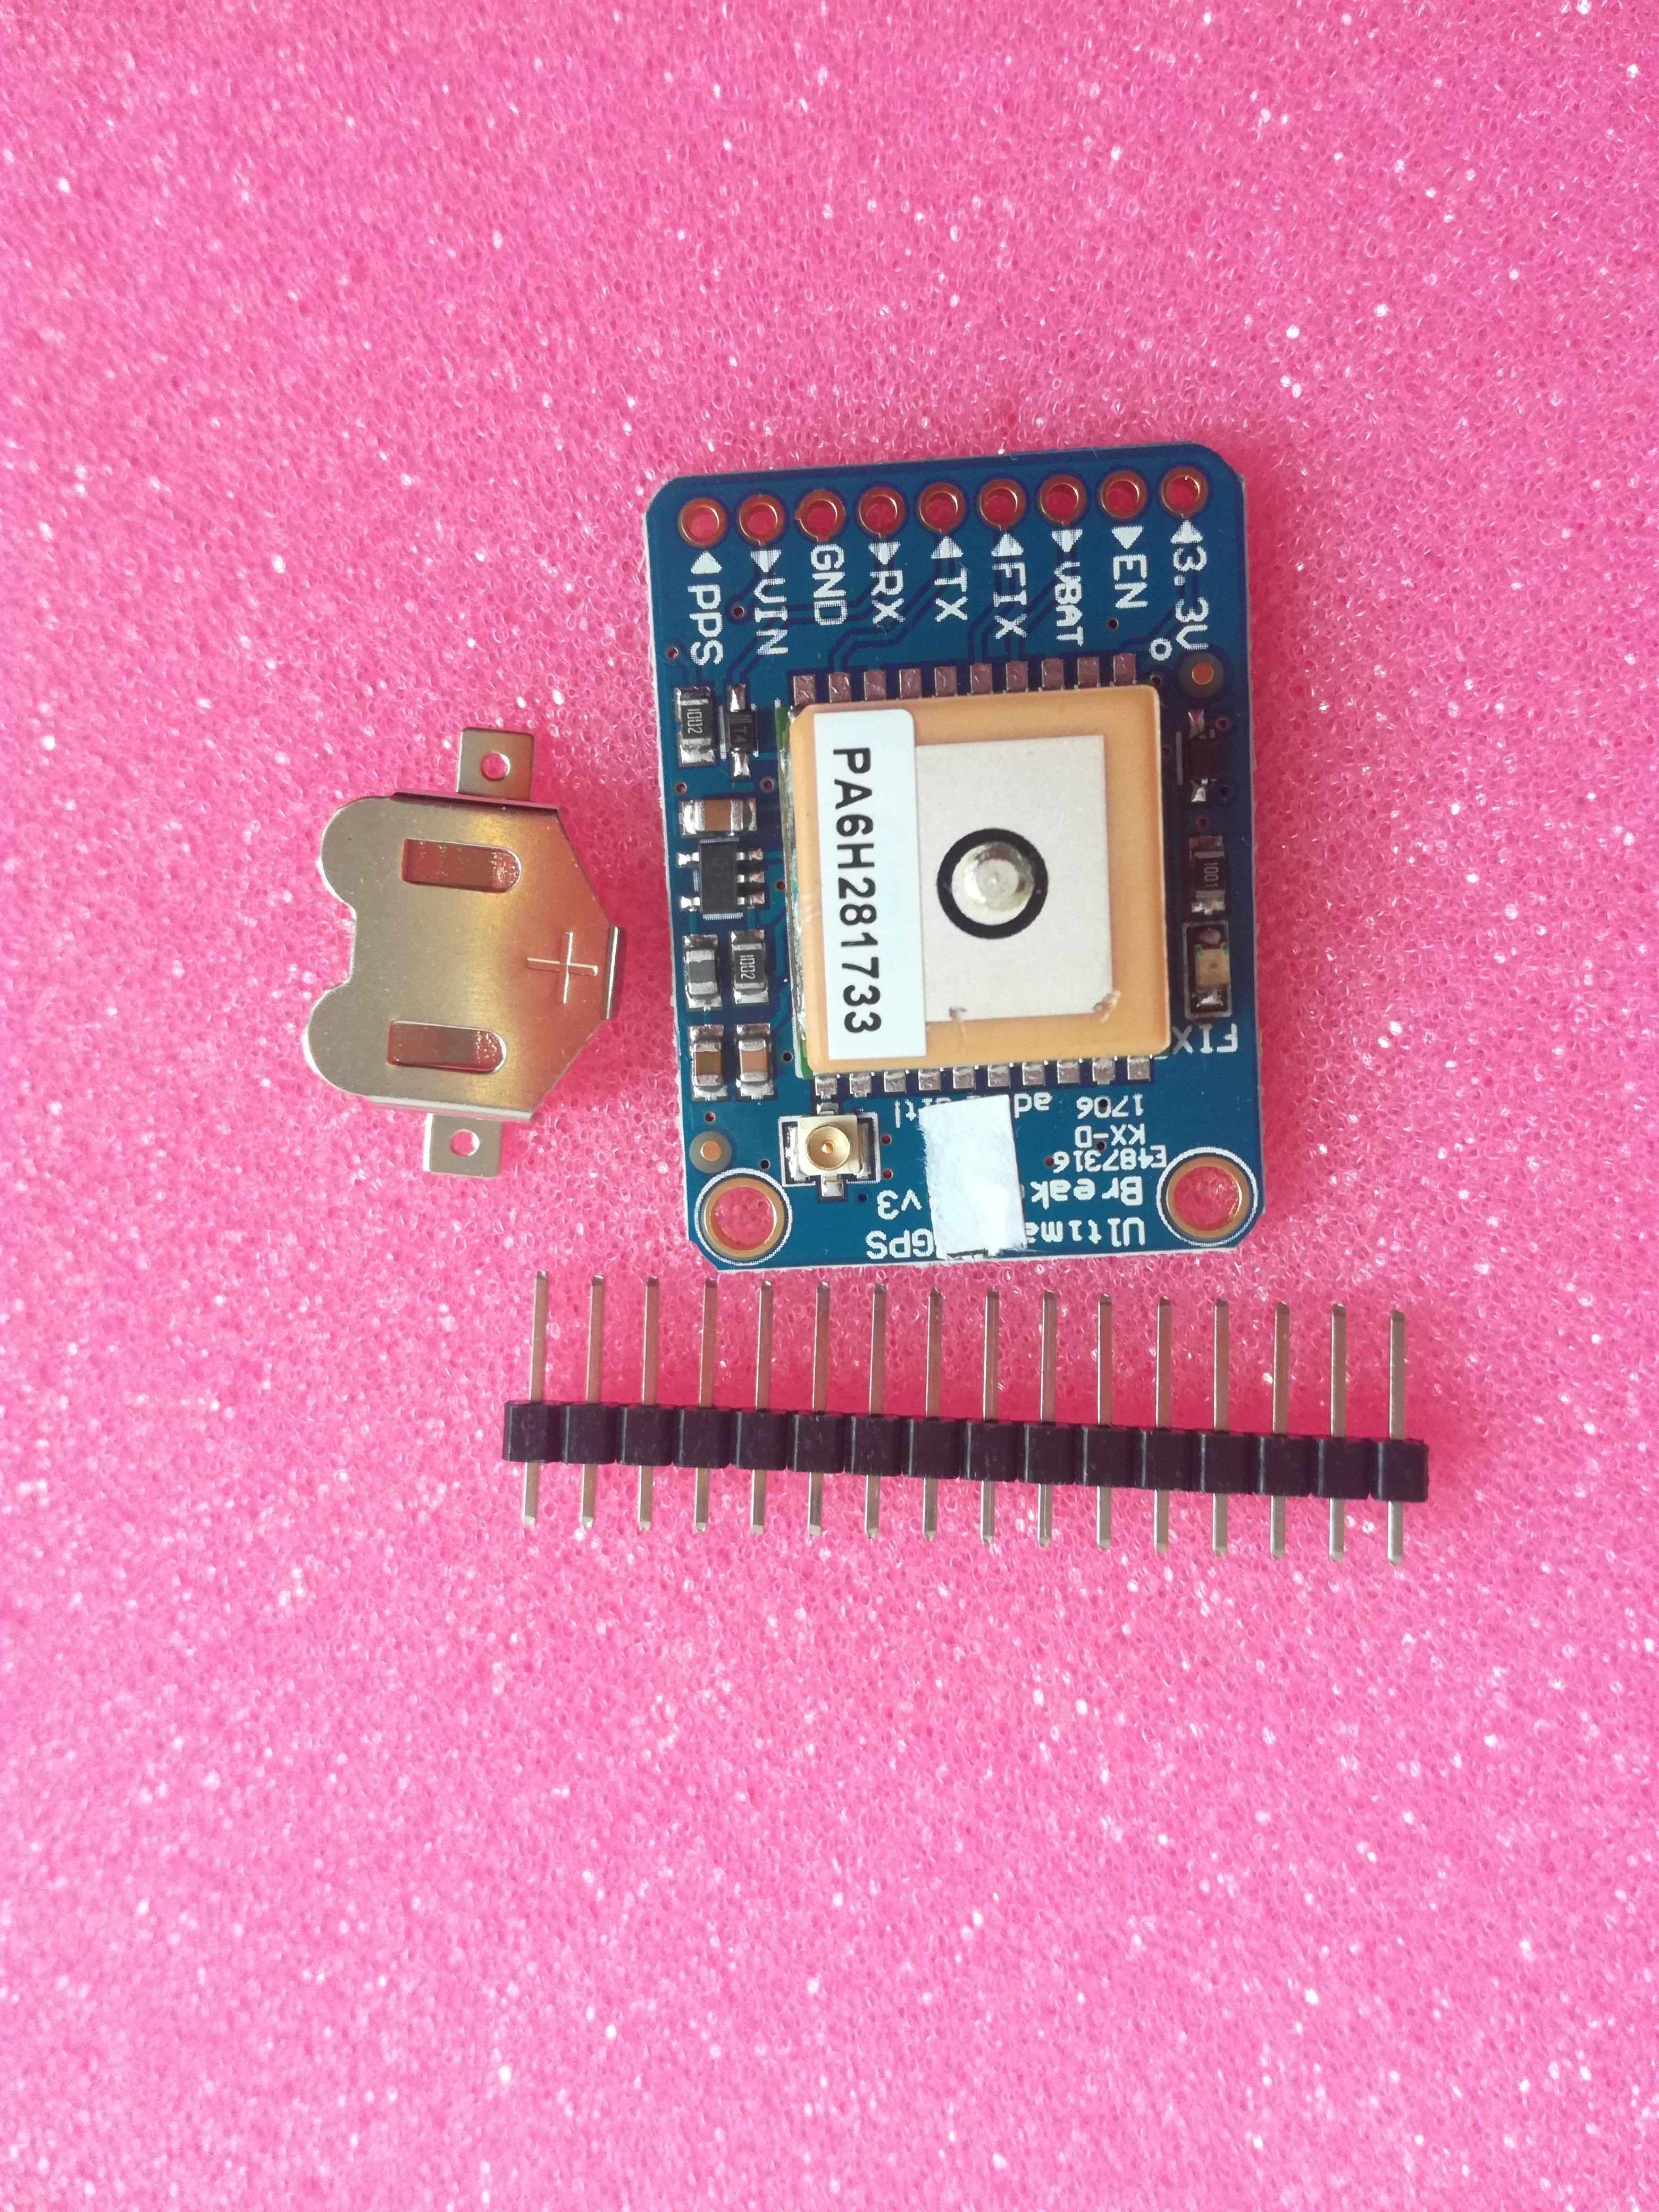 Ultimate Mt3339gps Engine Boardpot Gps Module Pa6h 10hz115200bps Pcba Pcb Assembly Circuit Board Spot 746 Breakout Development Mtk3339